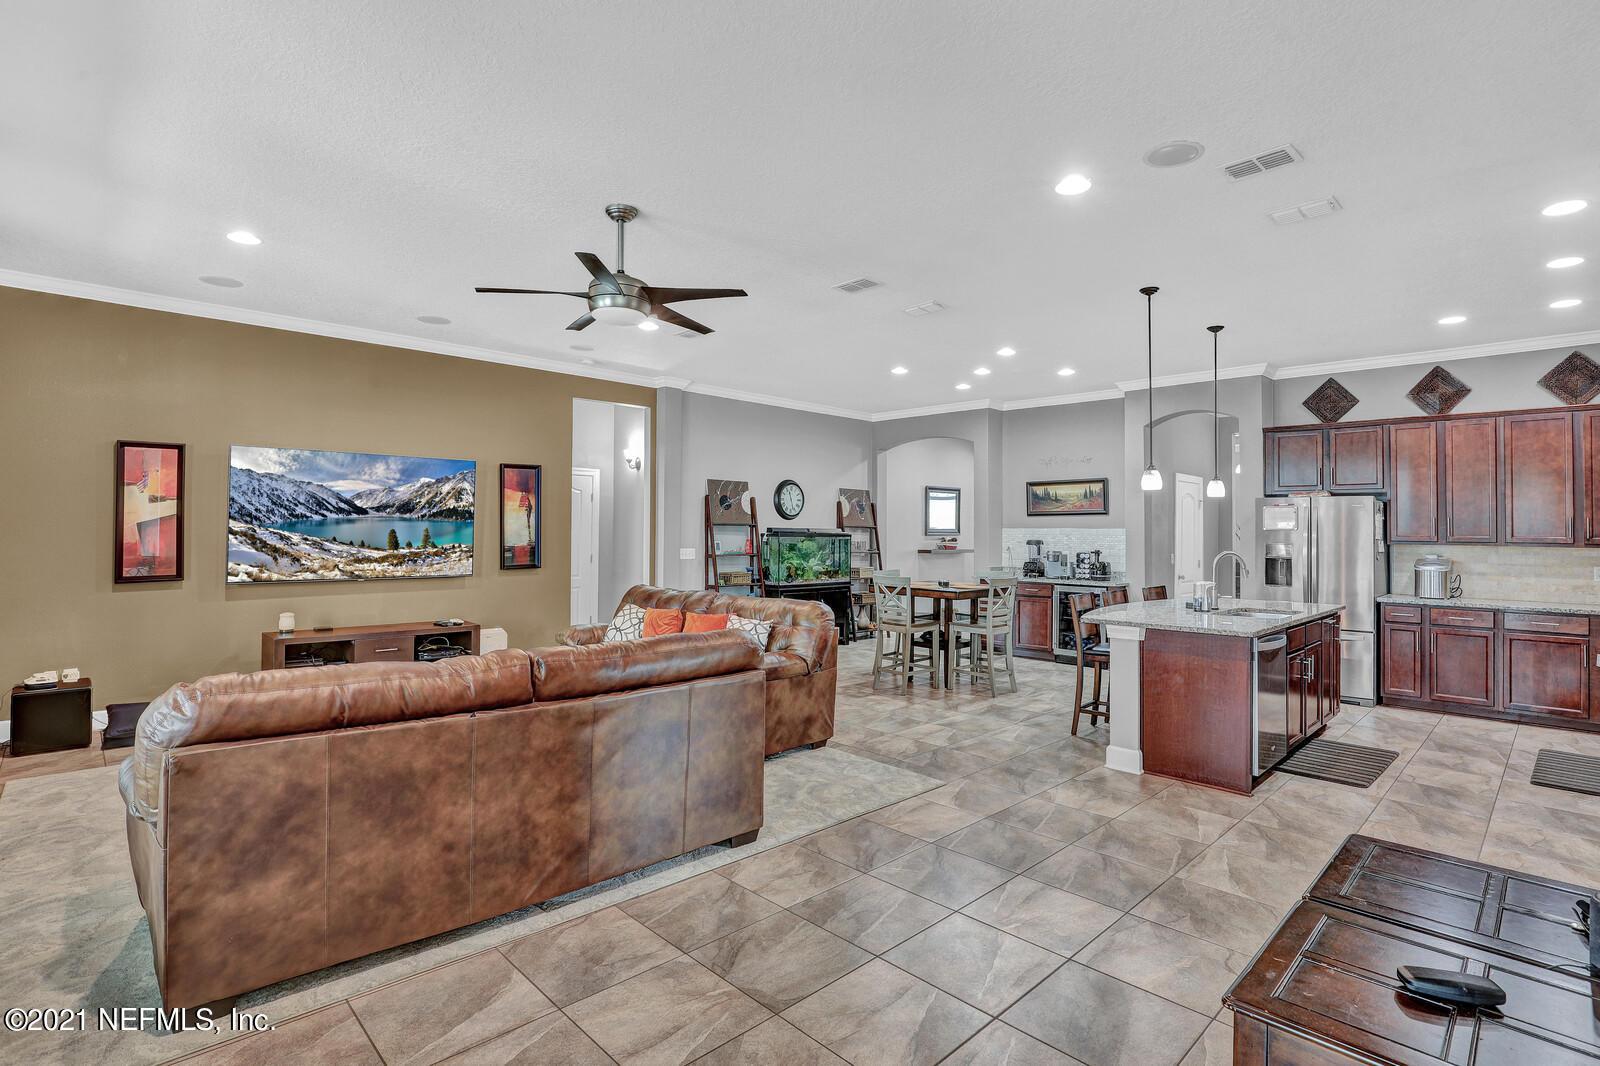 1083 MERLIN, MIDDLEBURG, FLORIDA 32068, 4 Bedrooms Bedrooms, ,3 BathroomsBathrooms,Residential,For sale,MERLIN,1100543